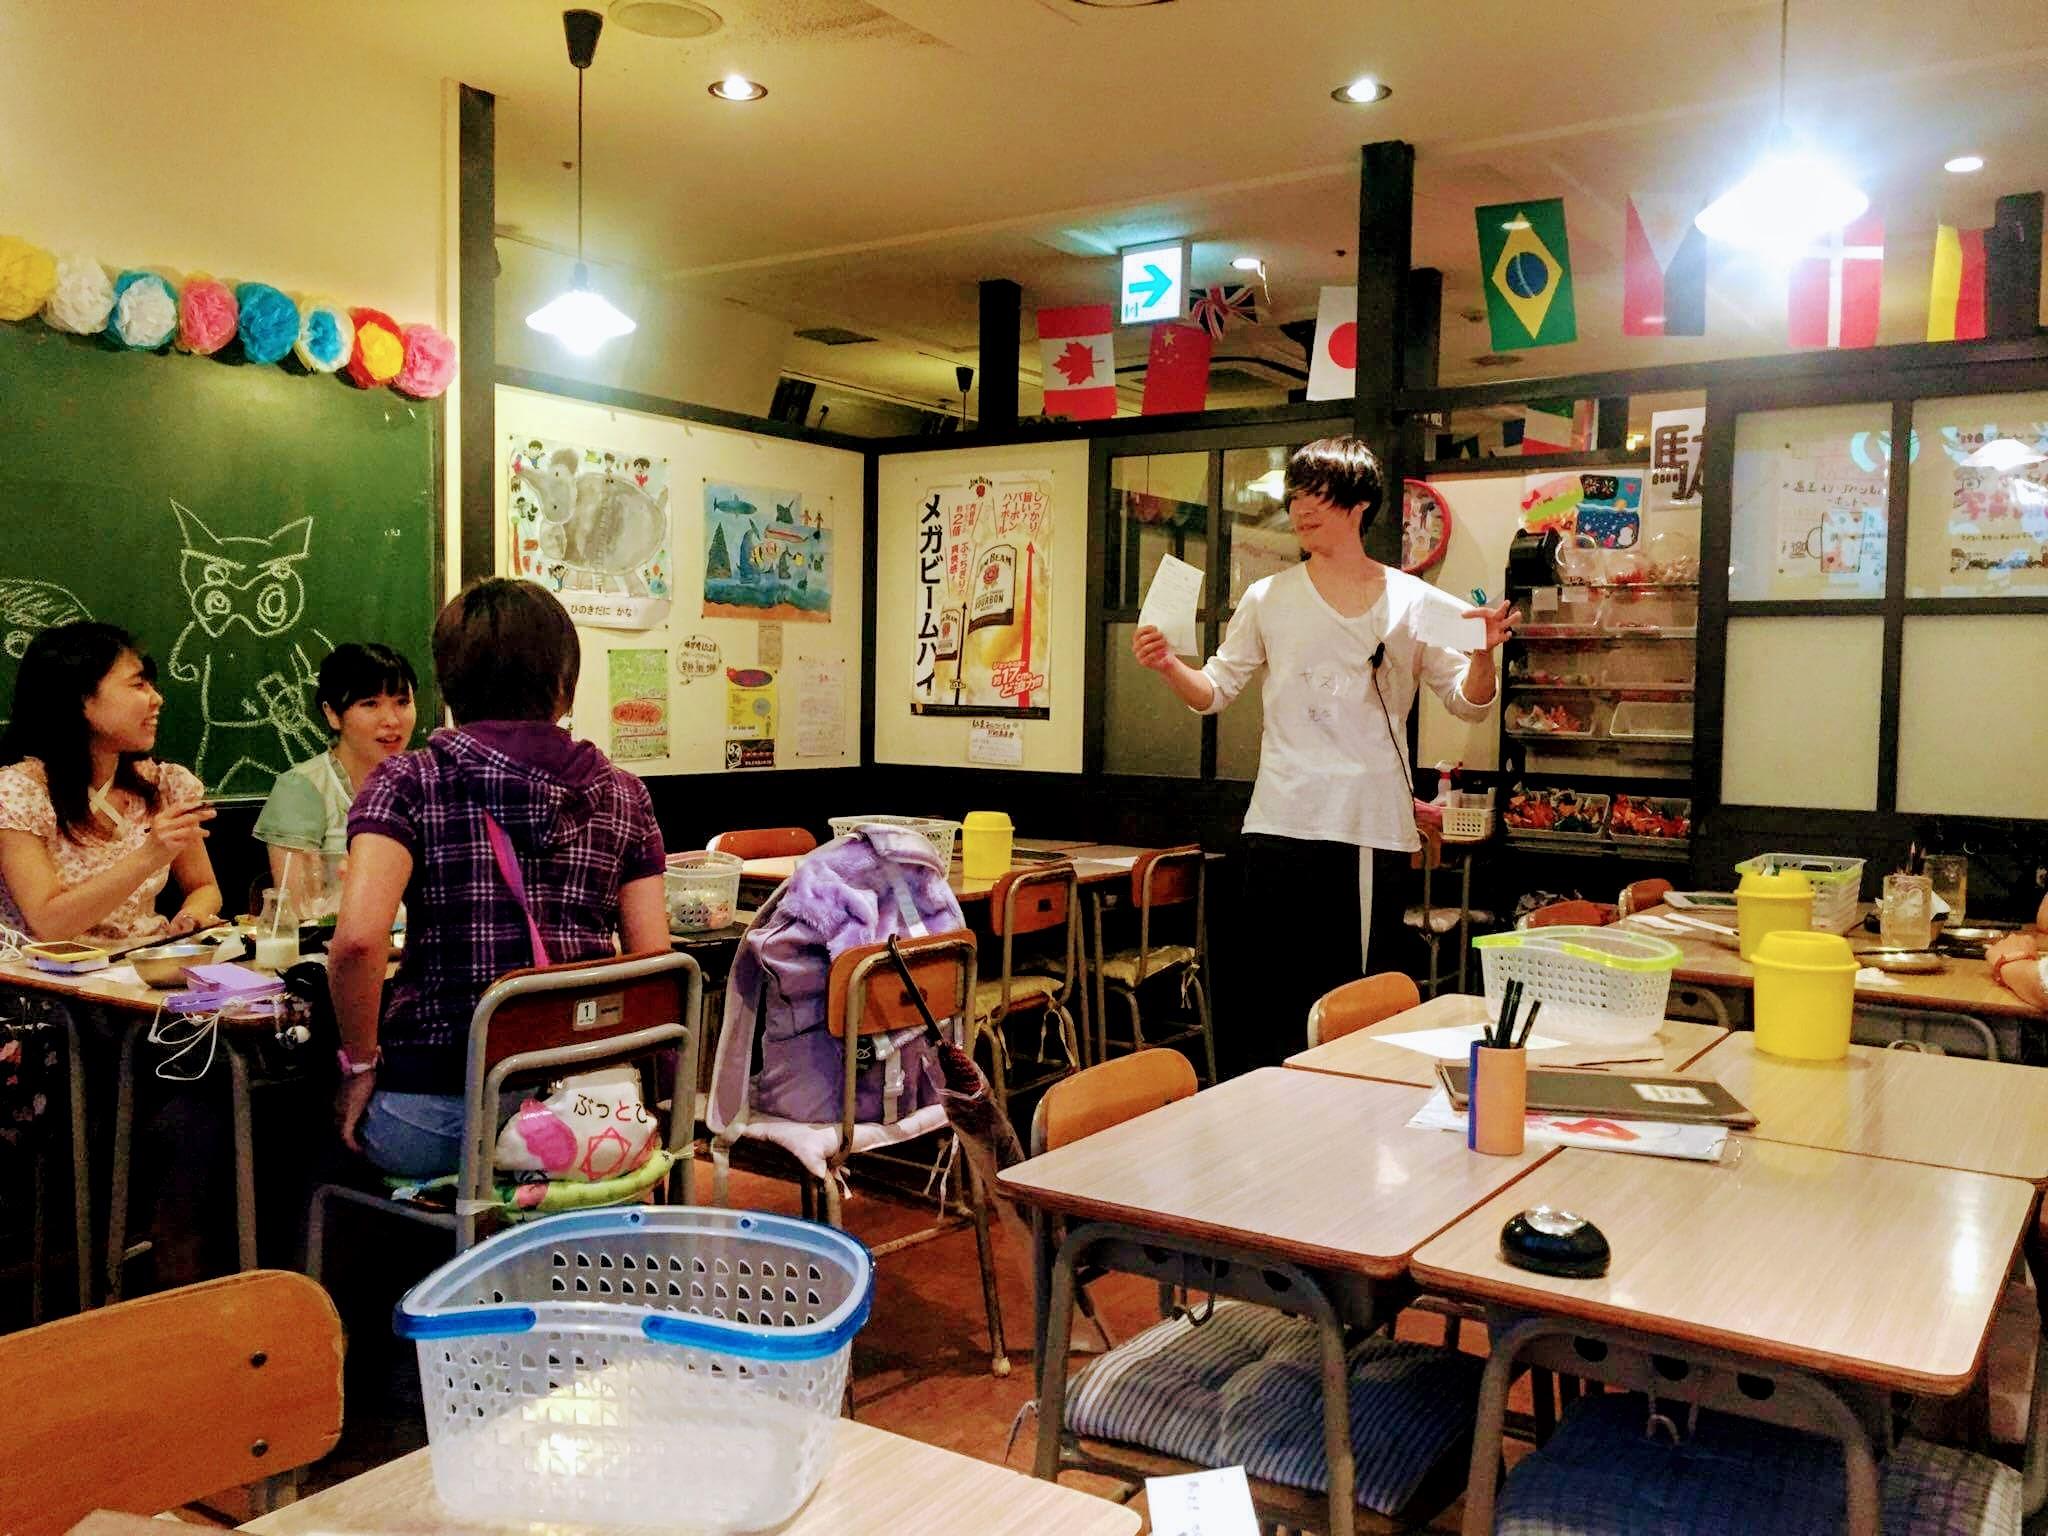 Rokunen Yonkumi Classroom